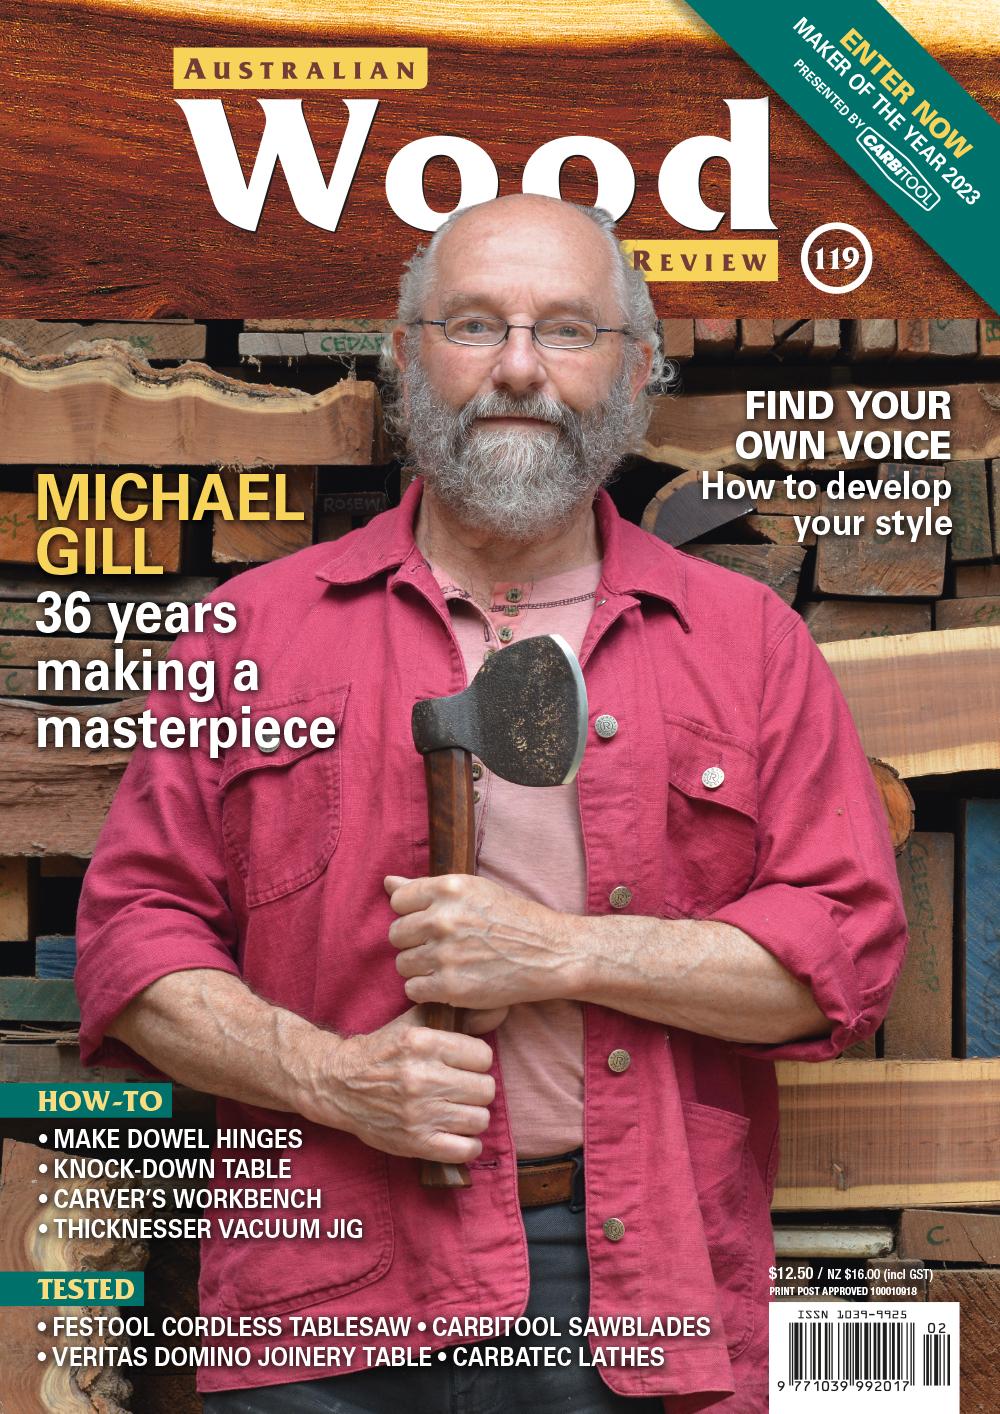 Australian Wood Review - Yaffa Media